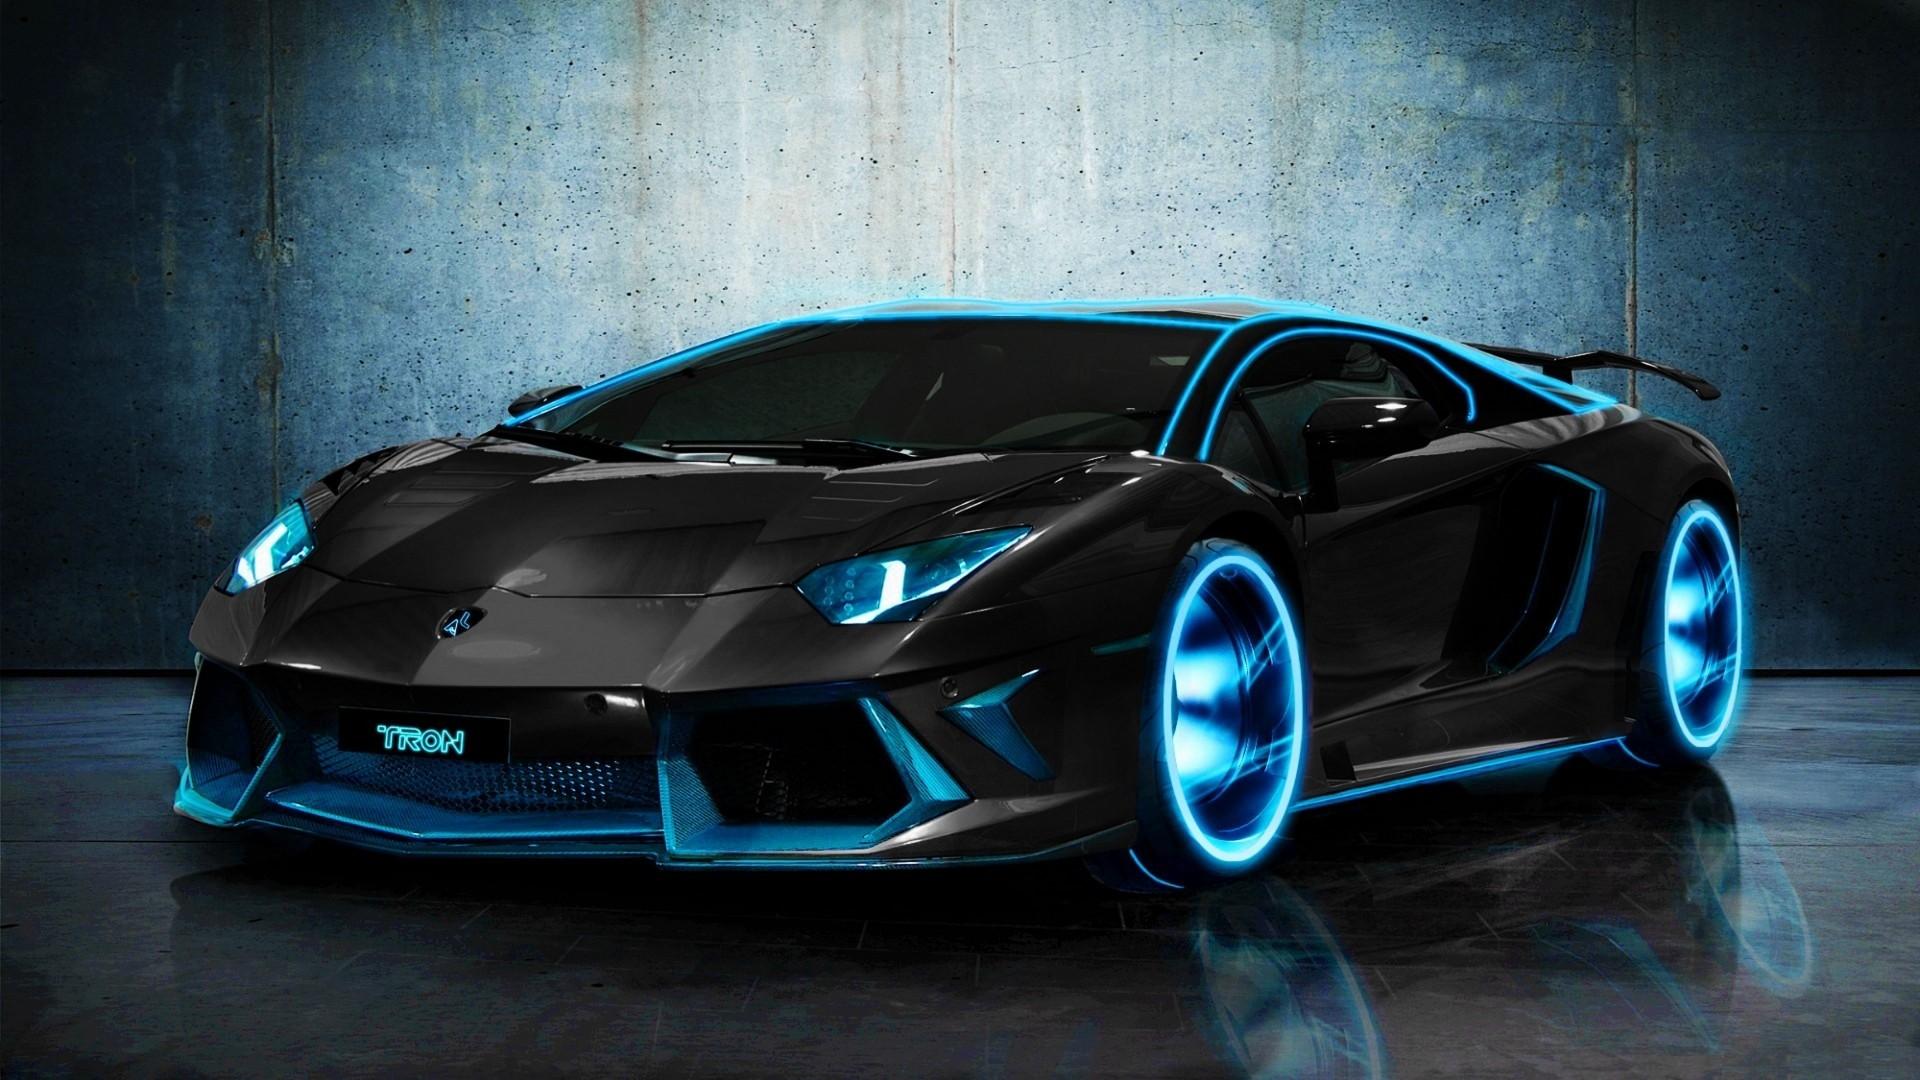 Wallpaper Lamborghini Aventador Black Cars Sports Car